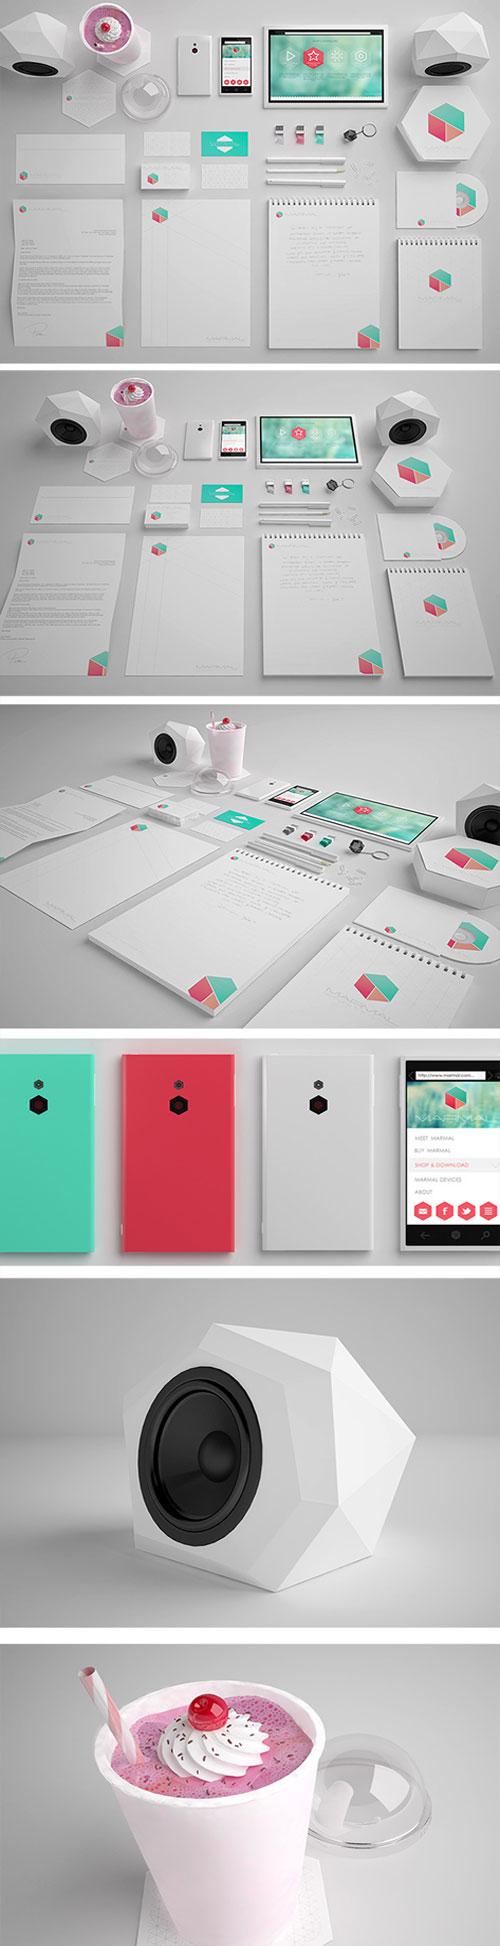 corporate_identity_design_6